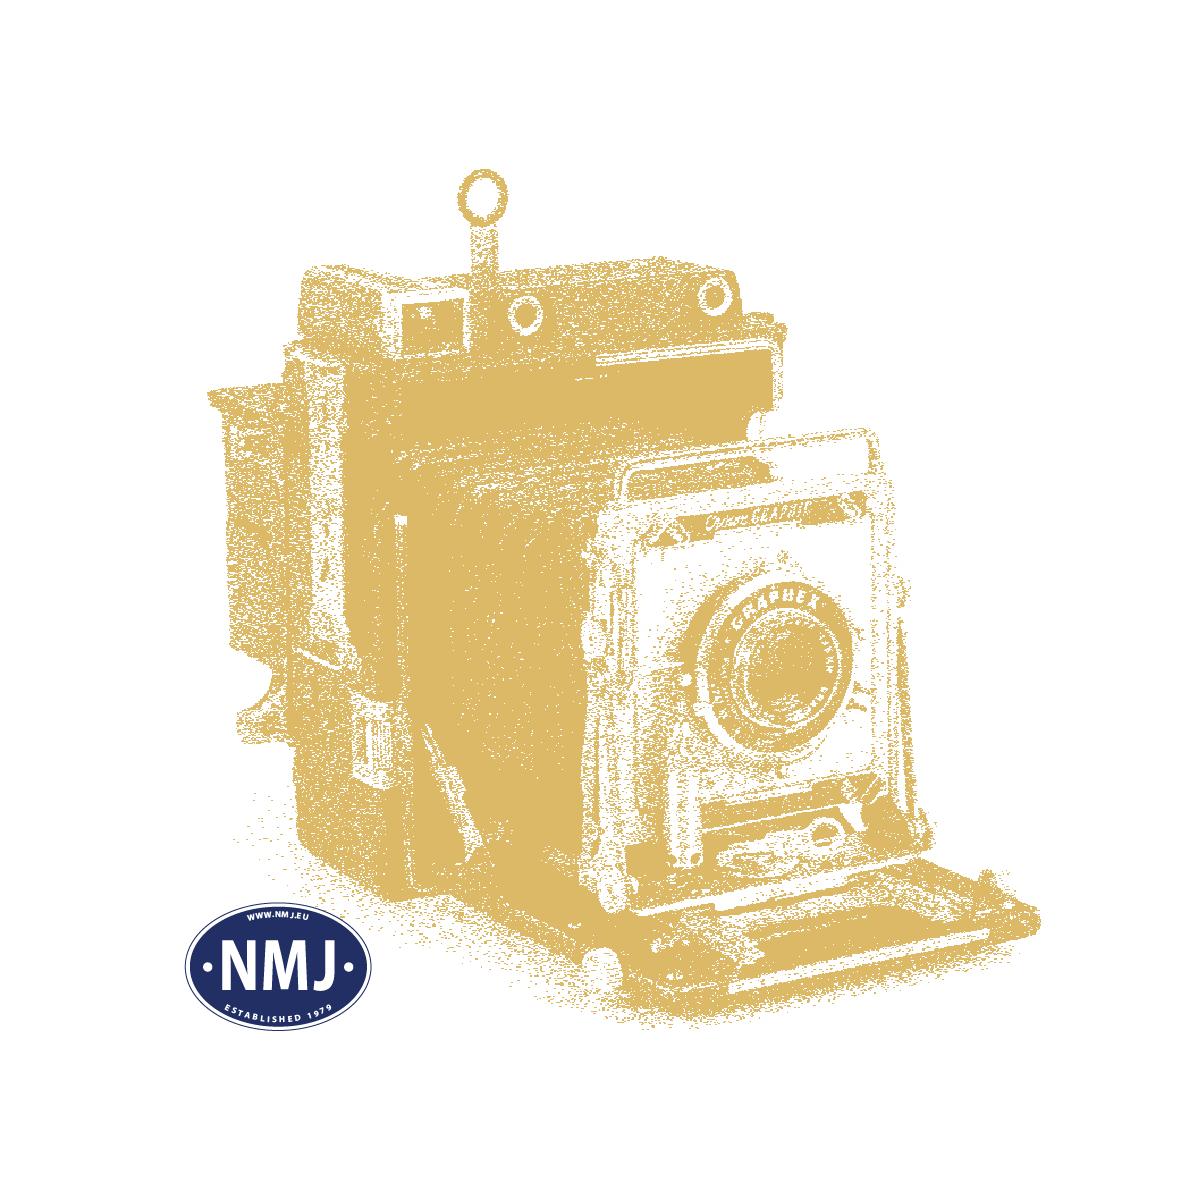 NMJT85.201 - NMJ Topline CargoNet Di8.702, DCC m/ Lyd